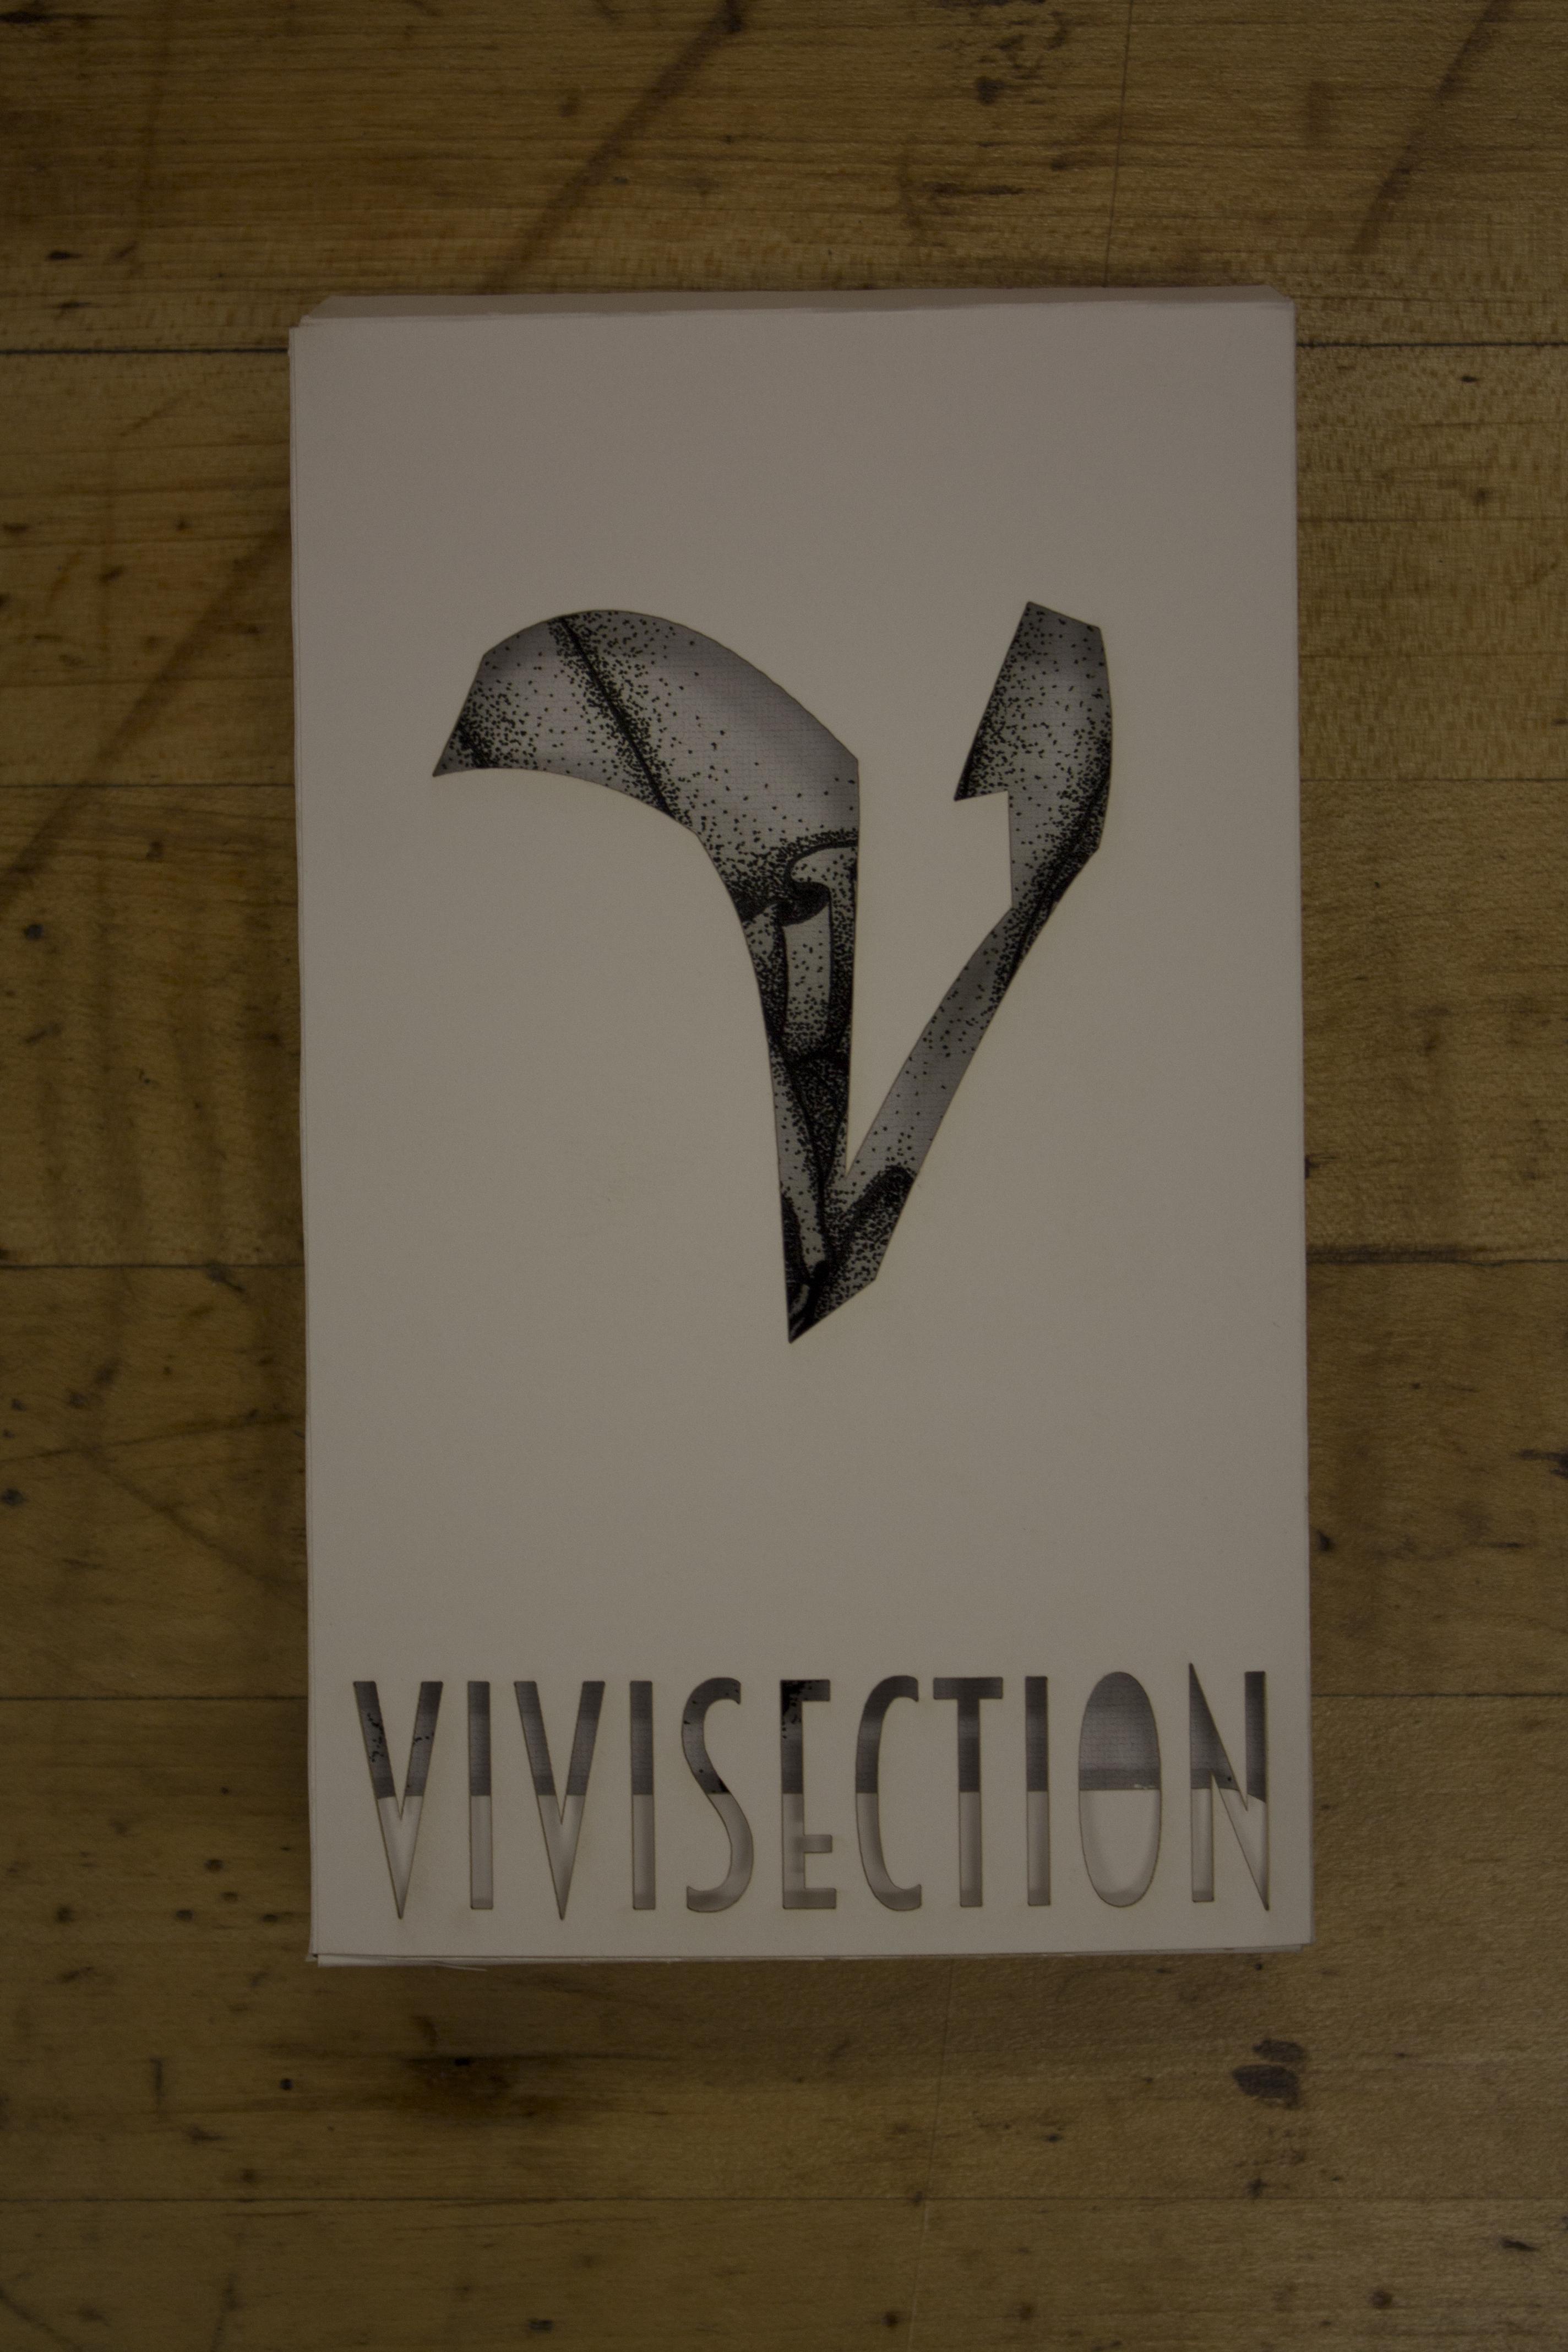 vivisection 64